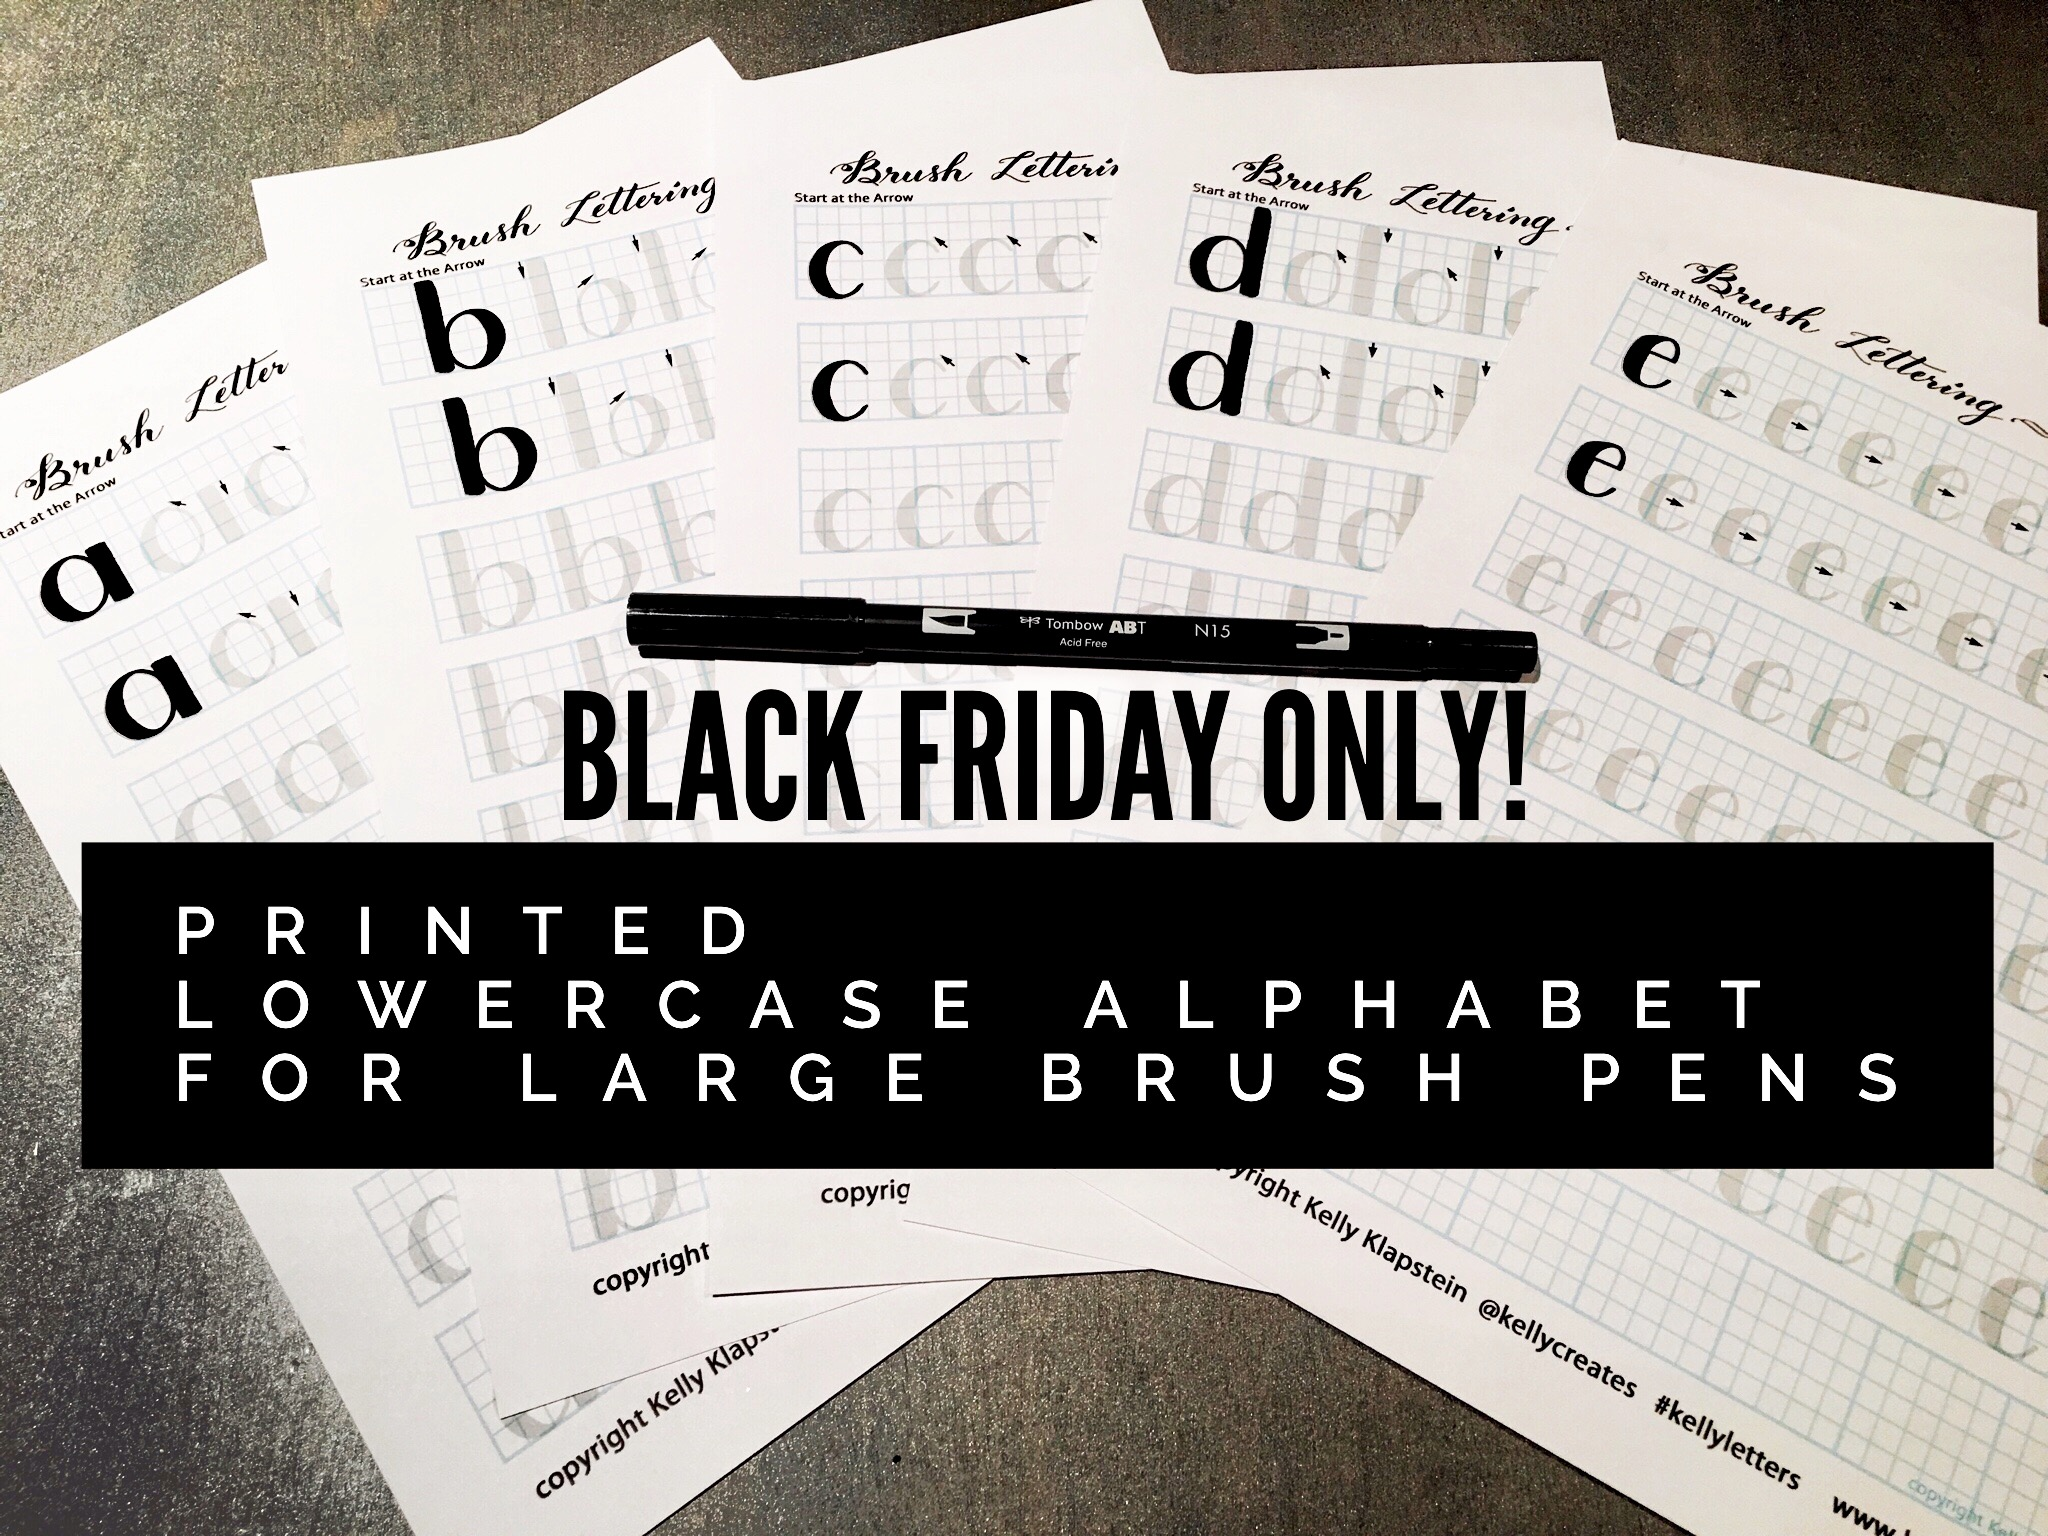 Black Friday One Day Sale Kelly Creates